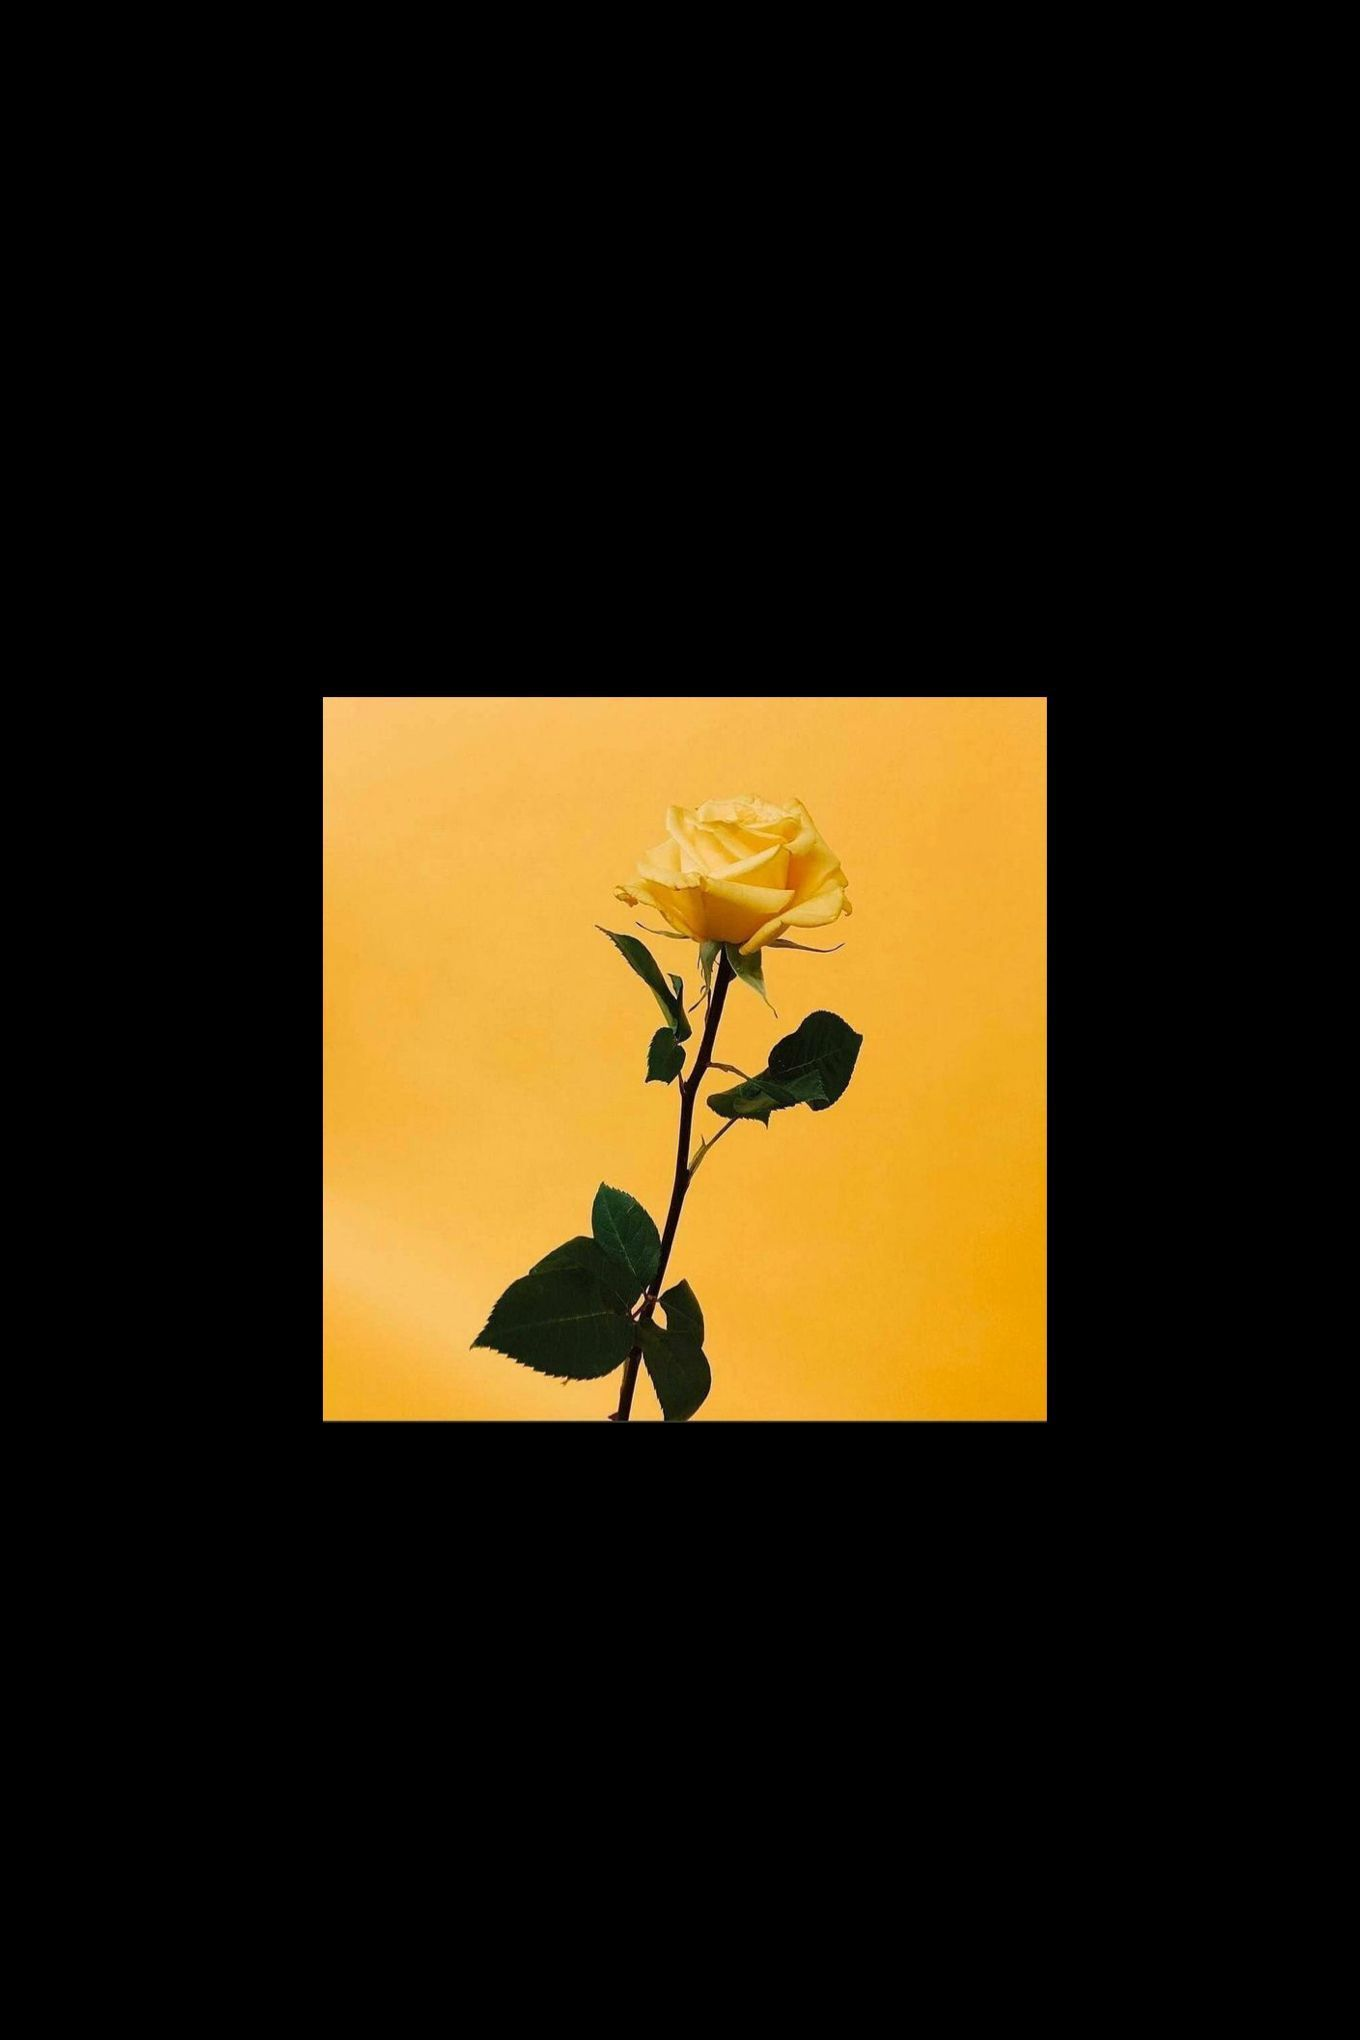 No Quote Yellow Black Rose Wallpaper Yellow Wallpaper Aesthetic In 2020 Iphone Wallpaper Yellow Black Aesthetic Wallpaper Aesthetic Wallpapers